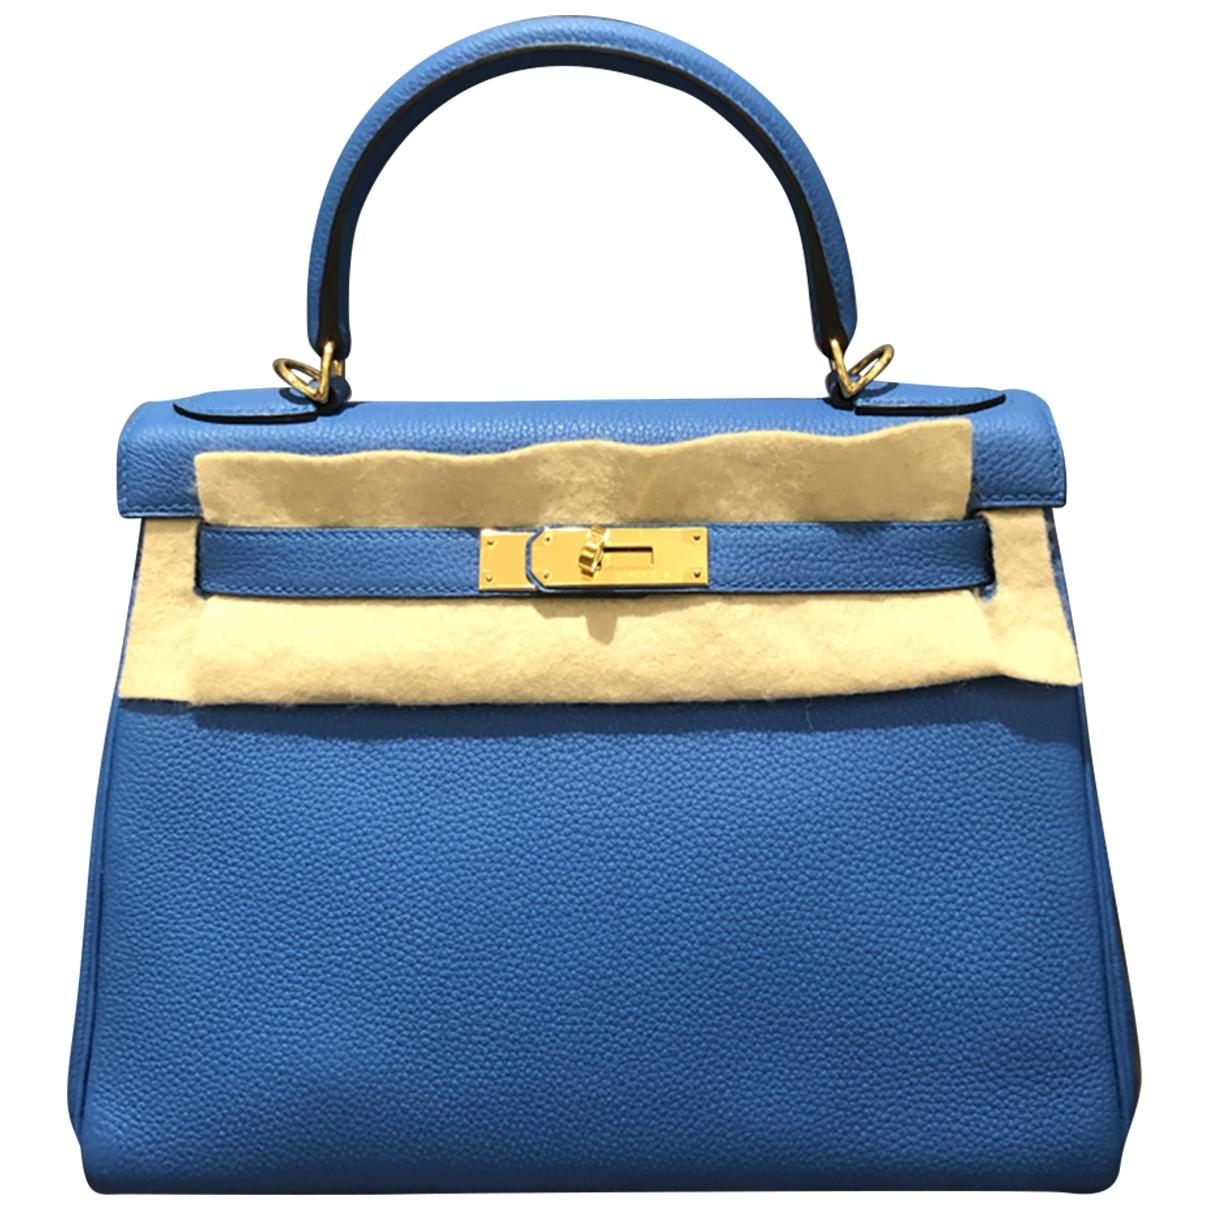 Hermes - Sac a main Kelly 28 pour femme en cuir - bleu